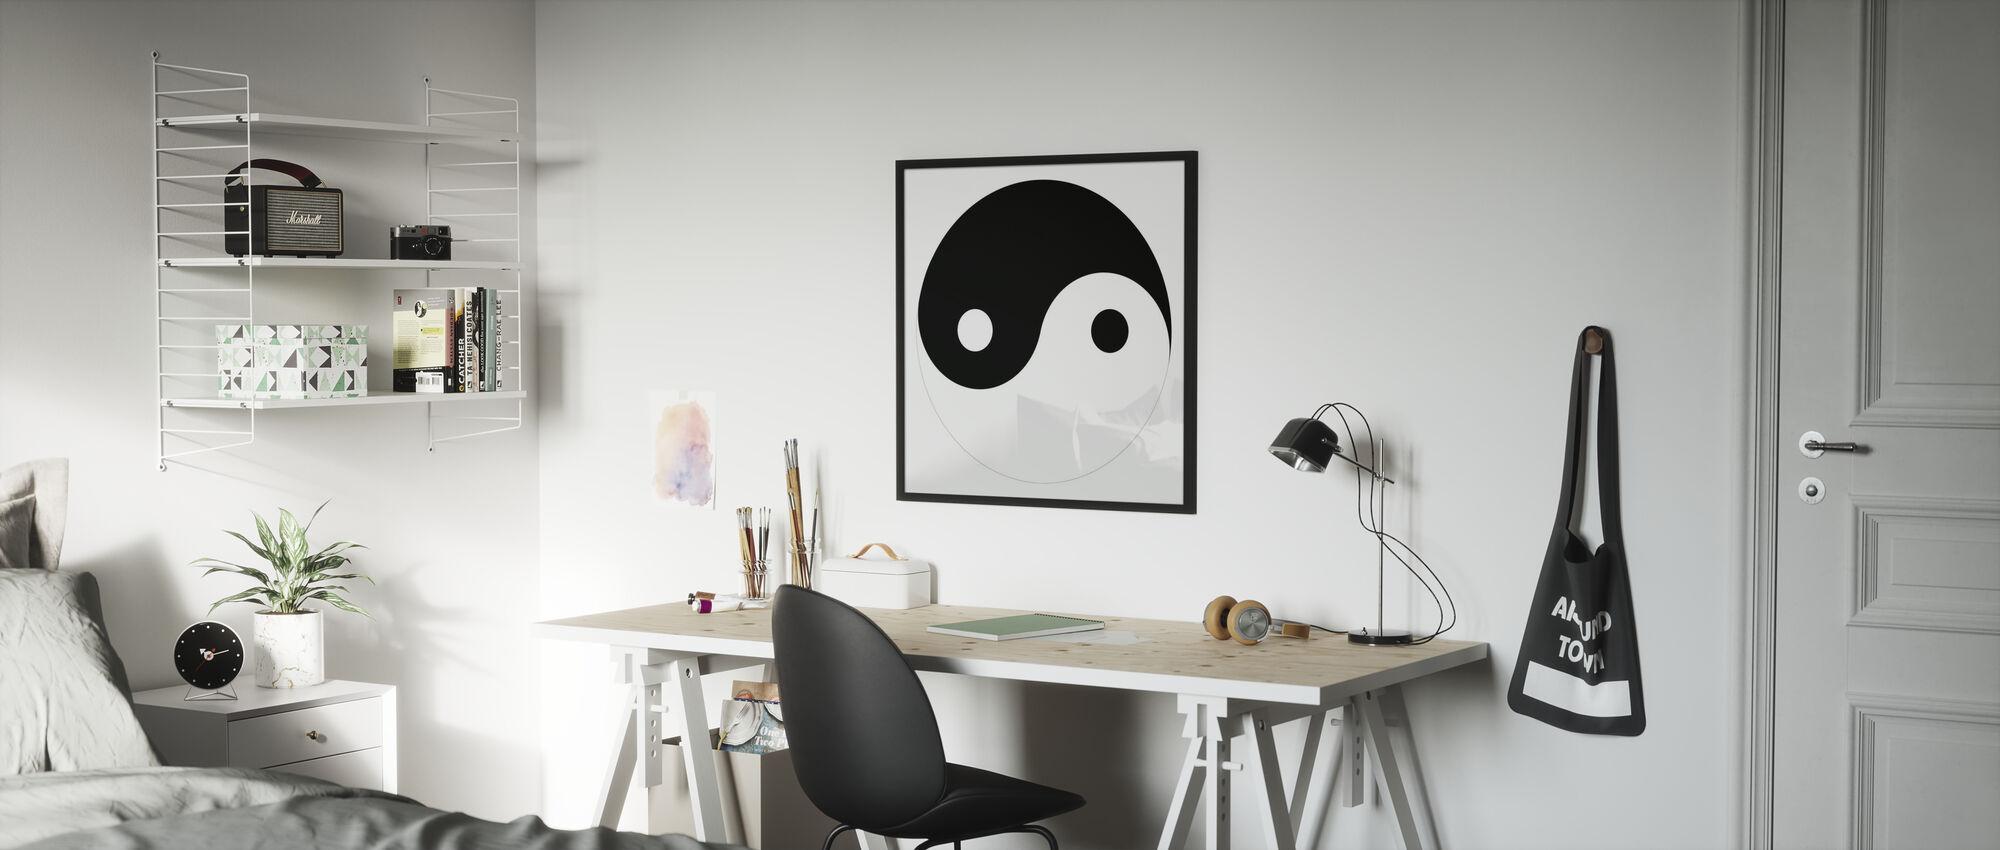 Yin-Yang - Poster - Kinderzimmer